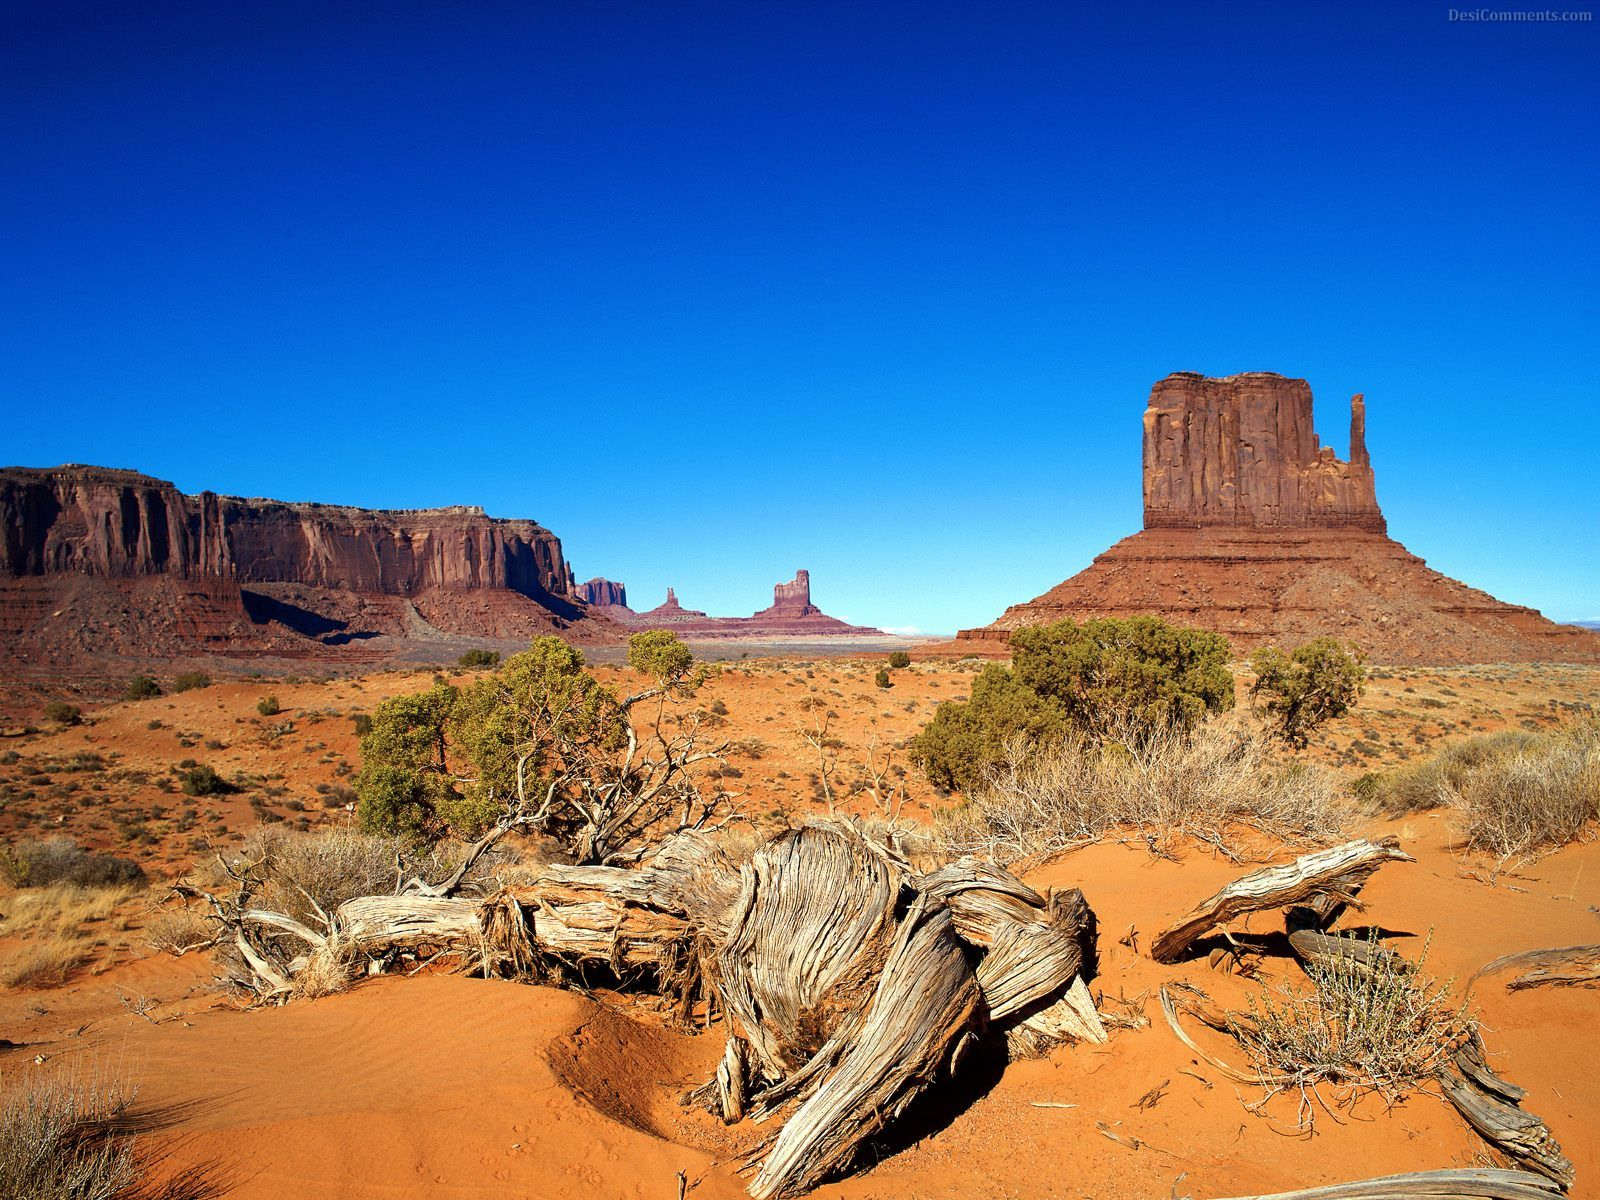 Desert Wallpaper 29 1600x1200